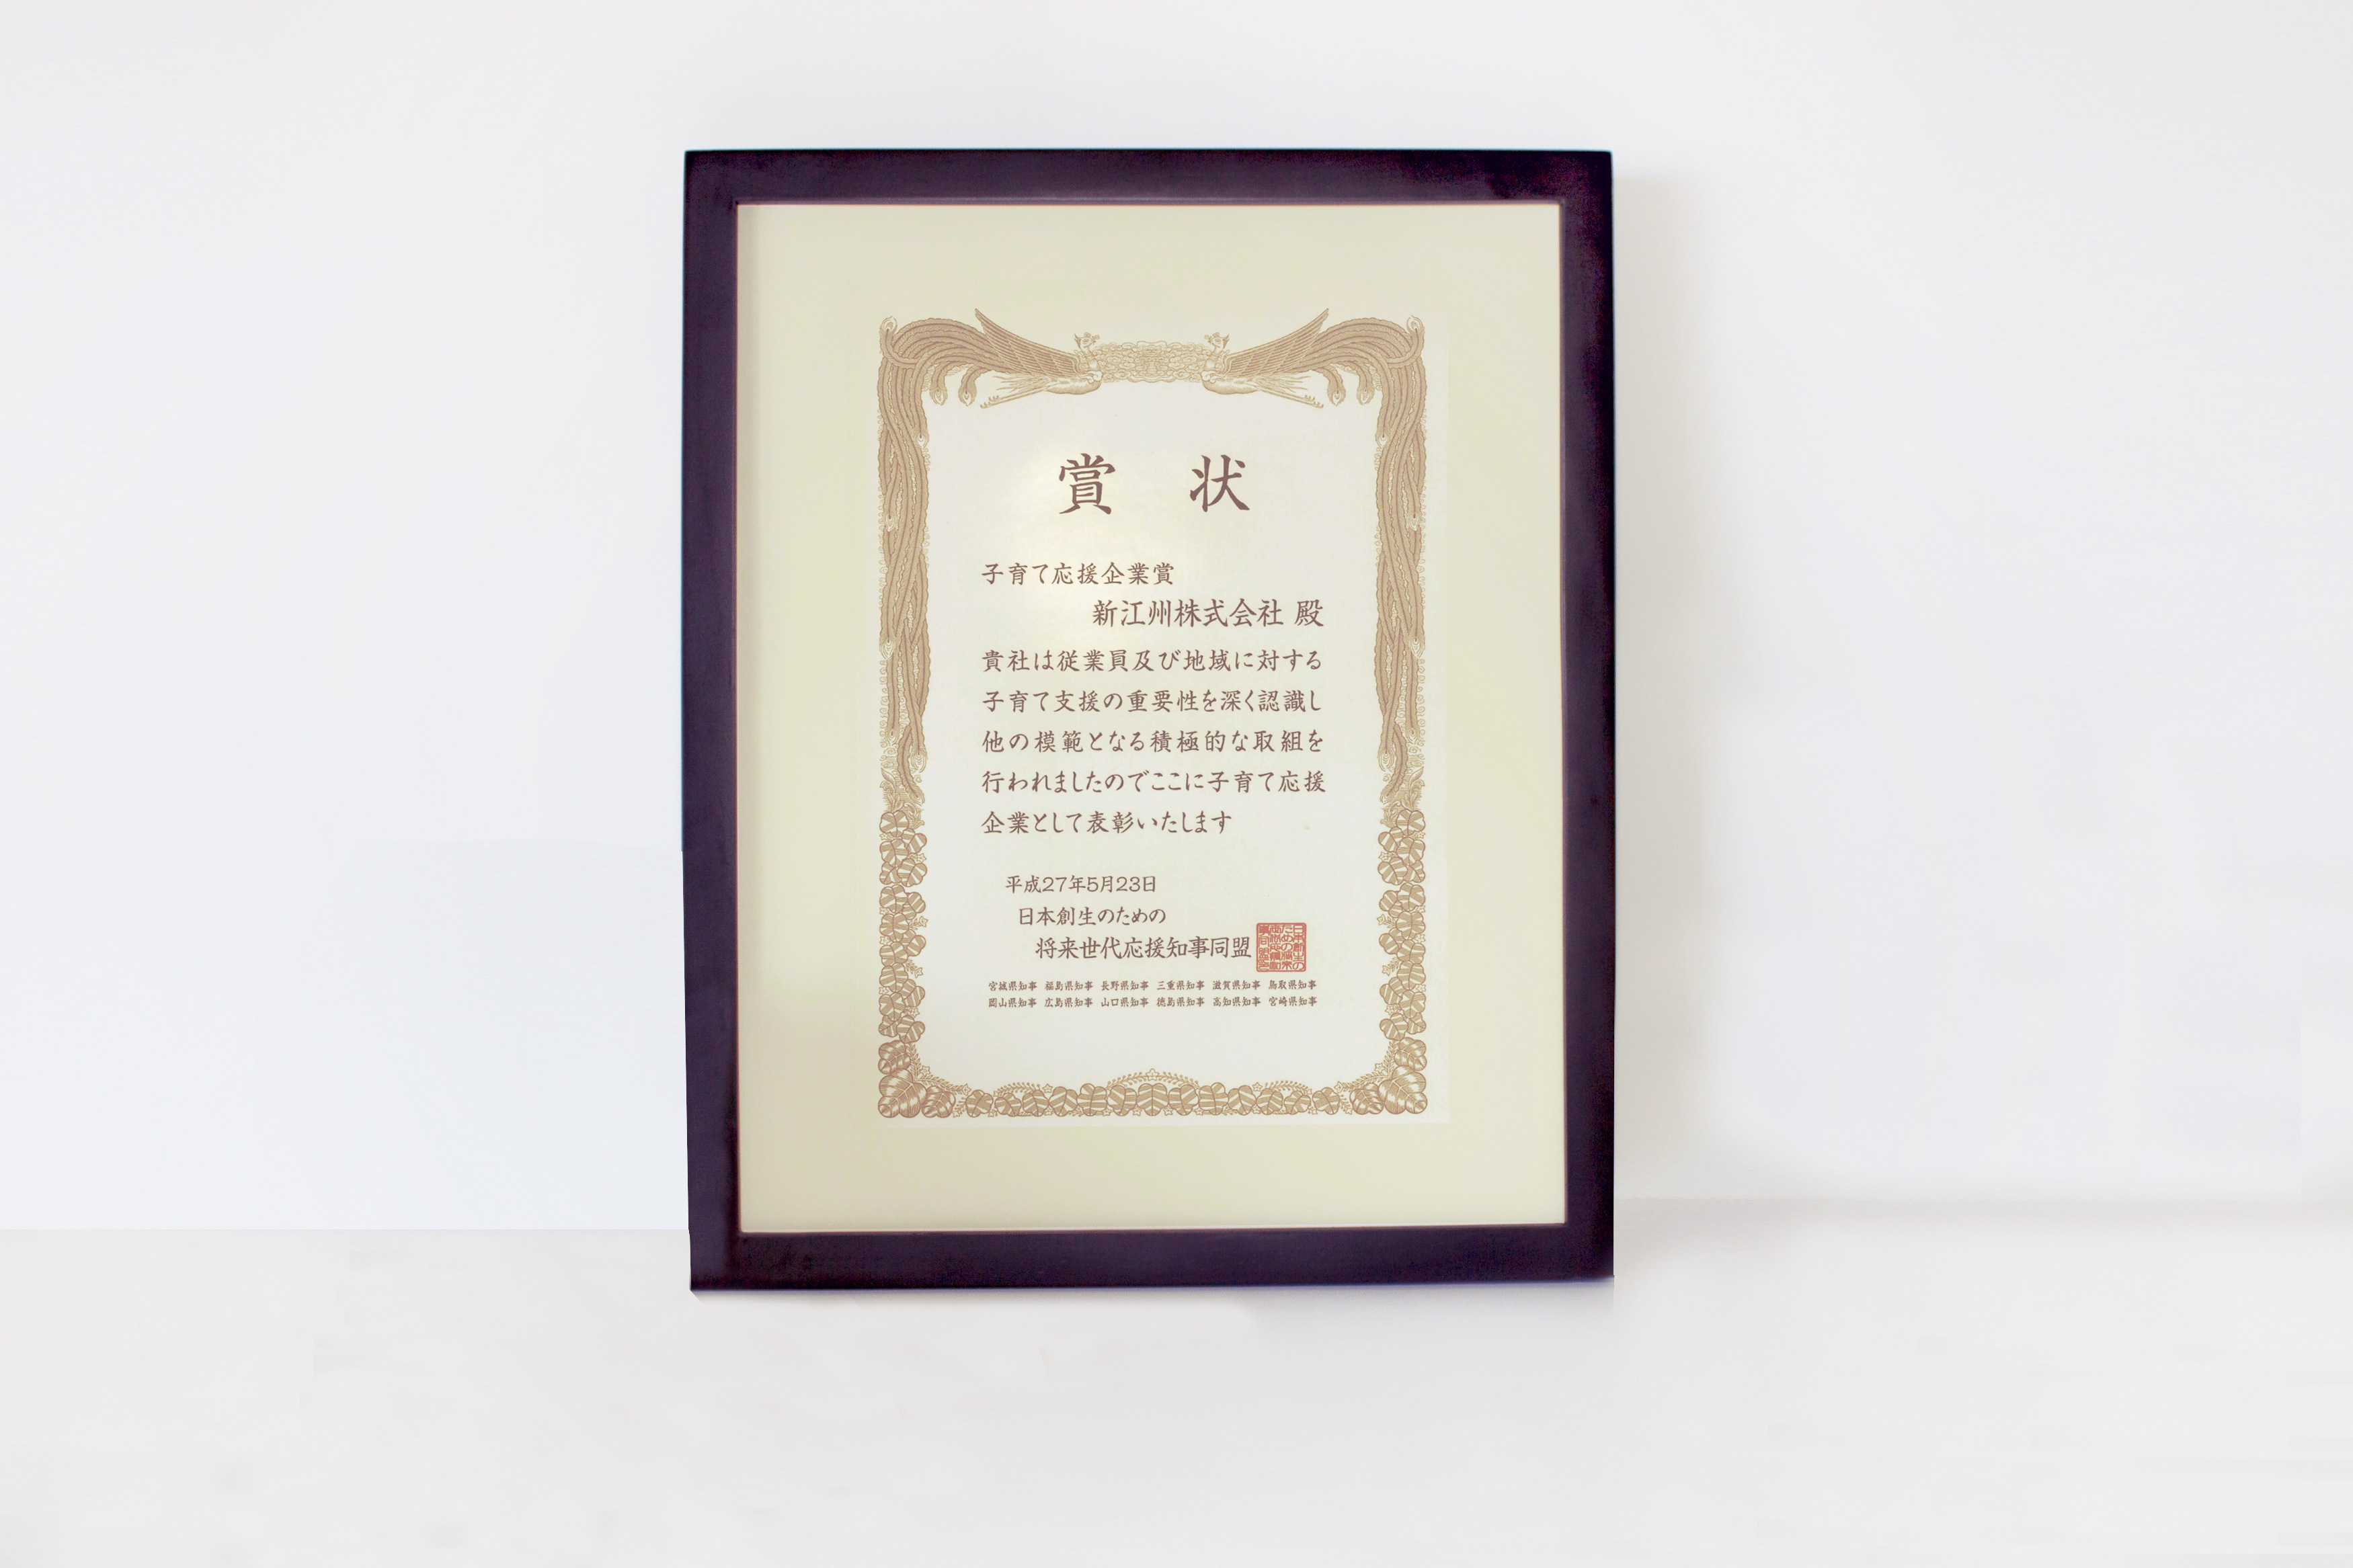 子育て応援企業賞 受賞